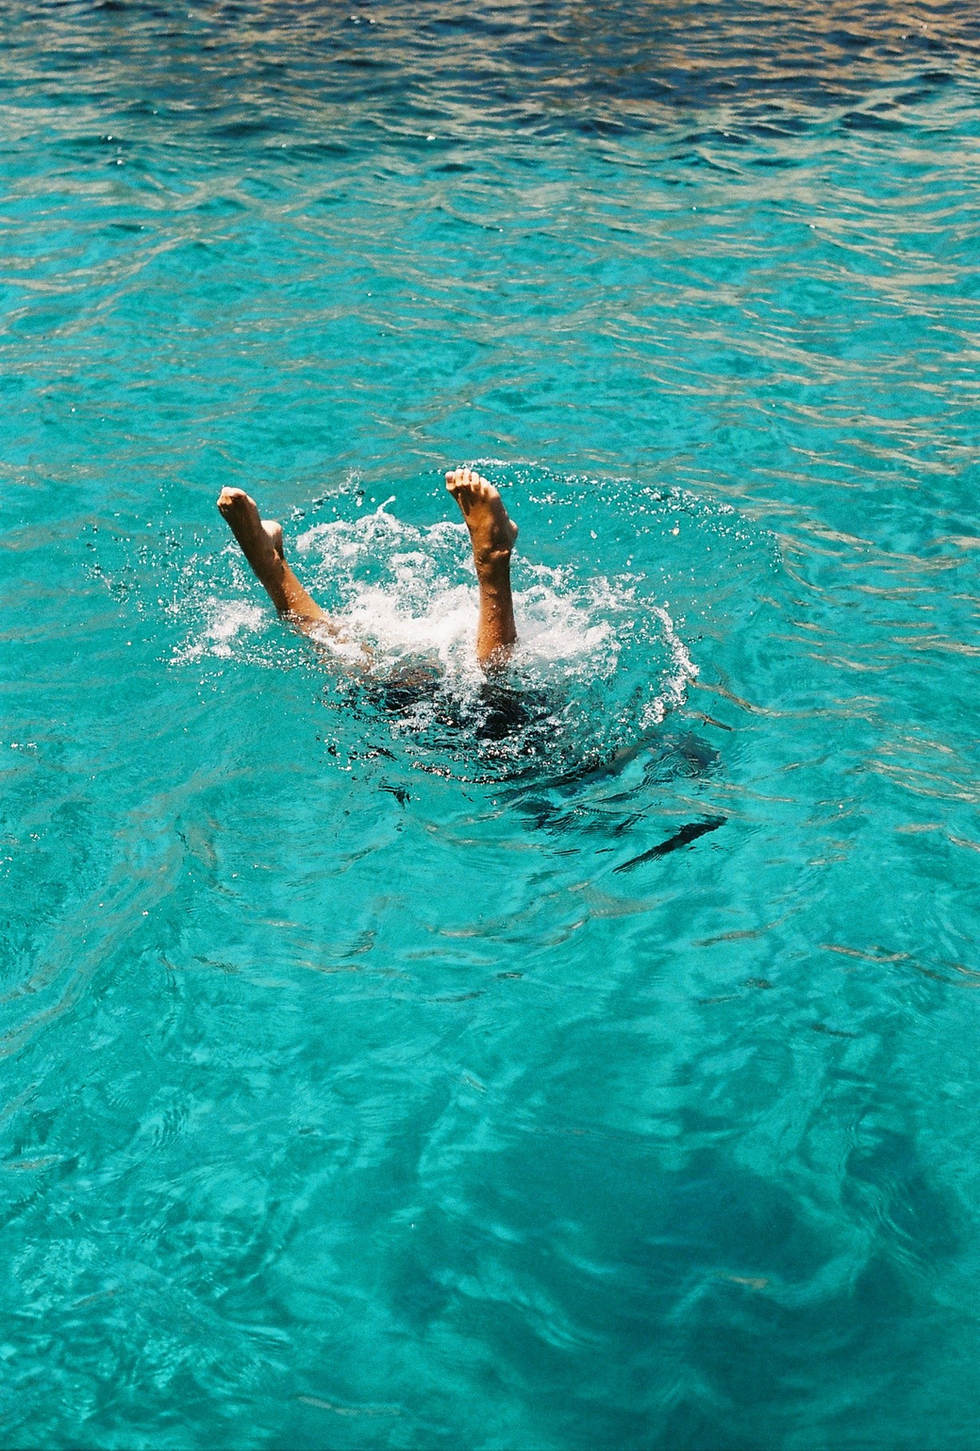 ruby ryan photo photograph photography feet water blue greece 35mm film